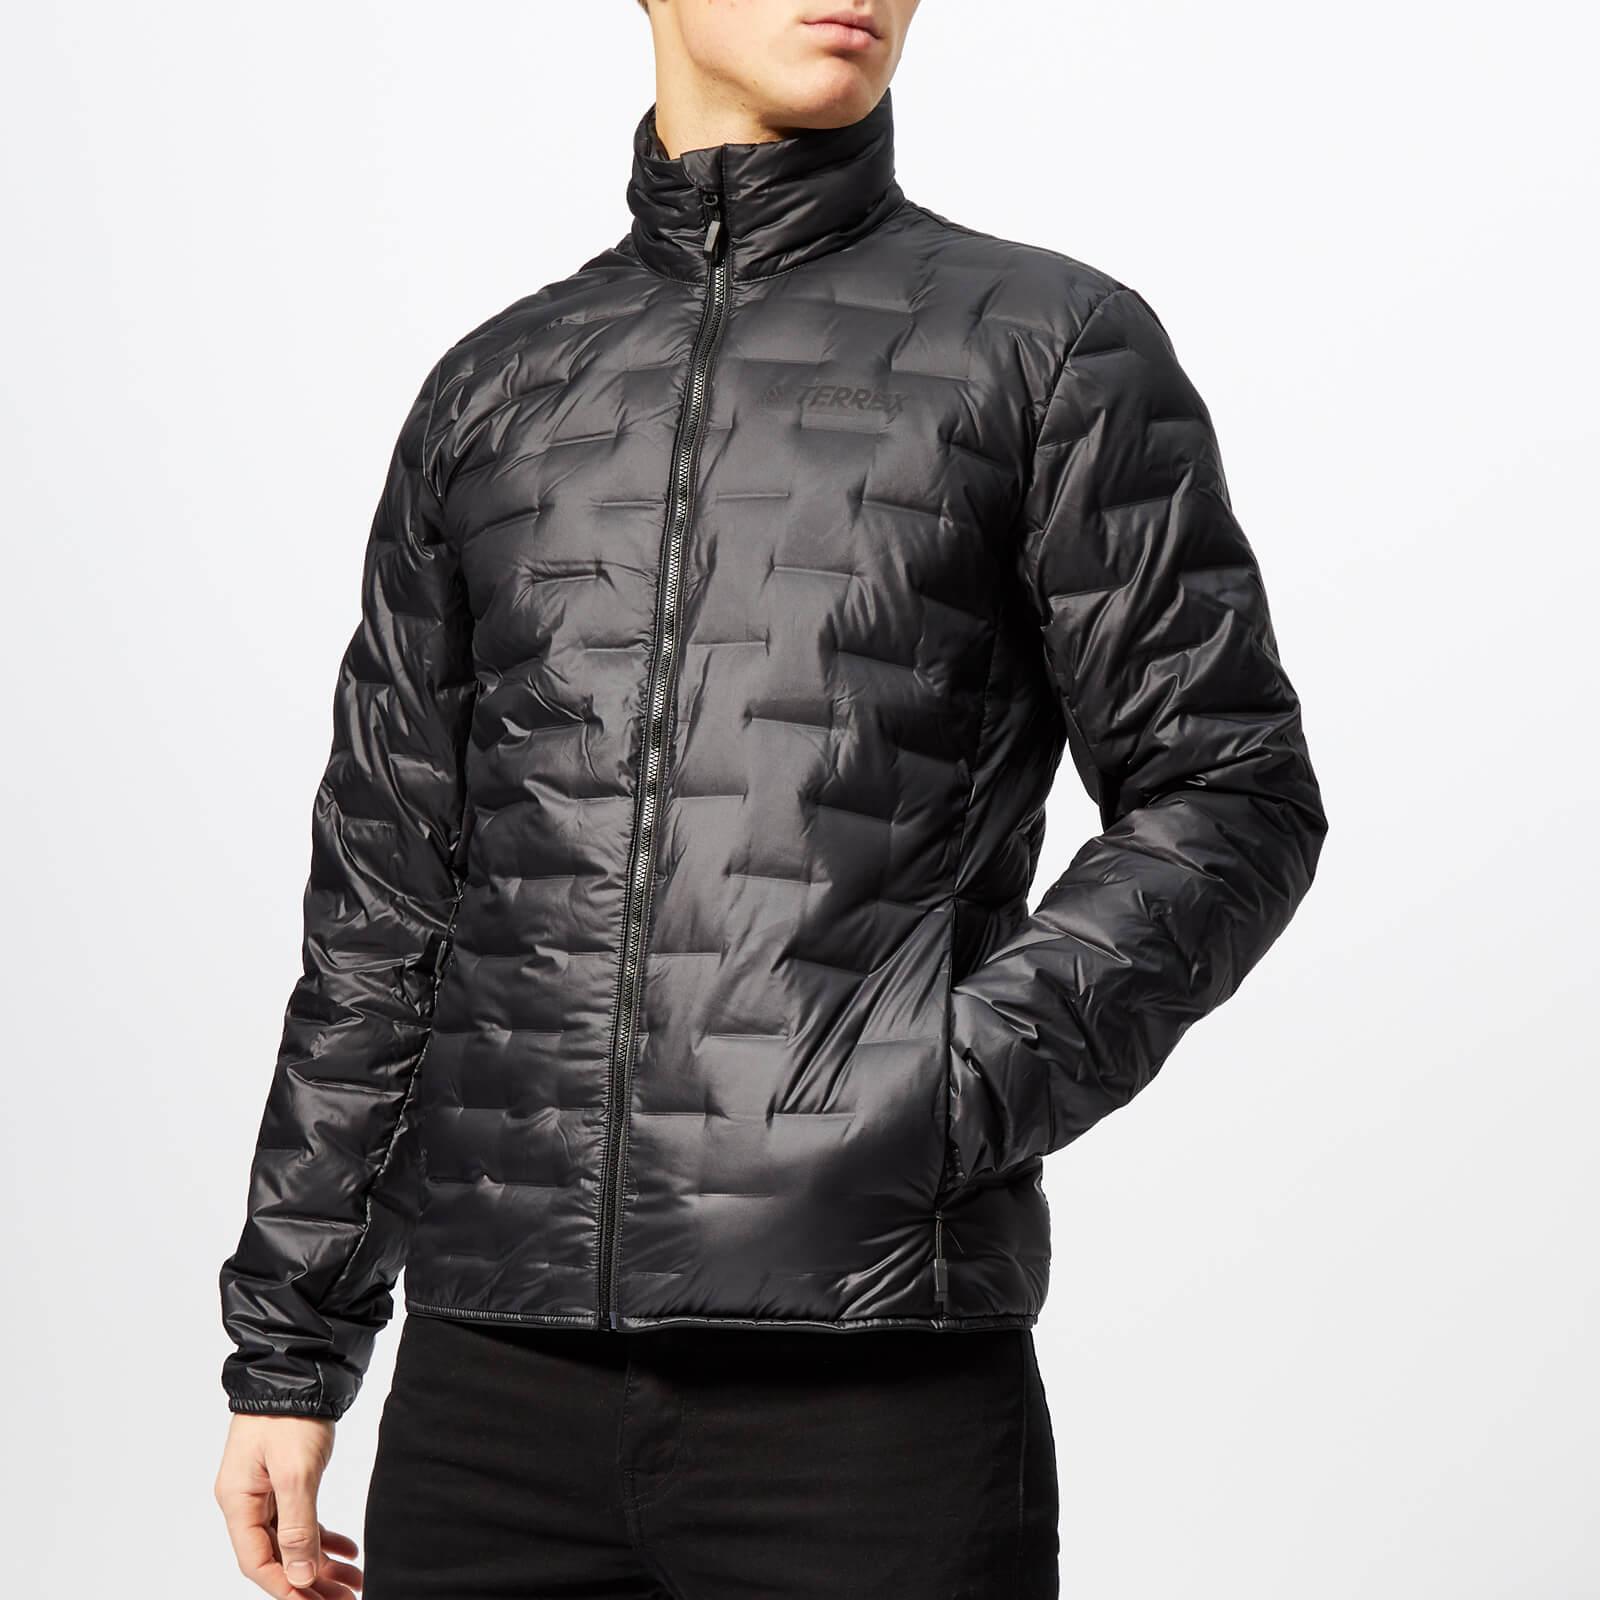 598dddbb33e05 adidas Men's Terrex Light Down Jacket - Black